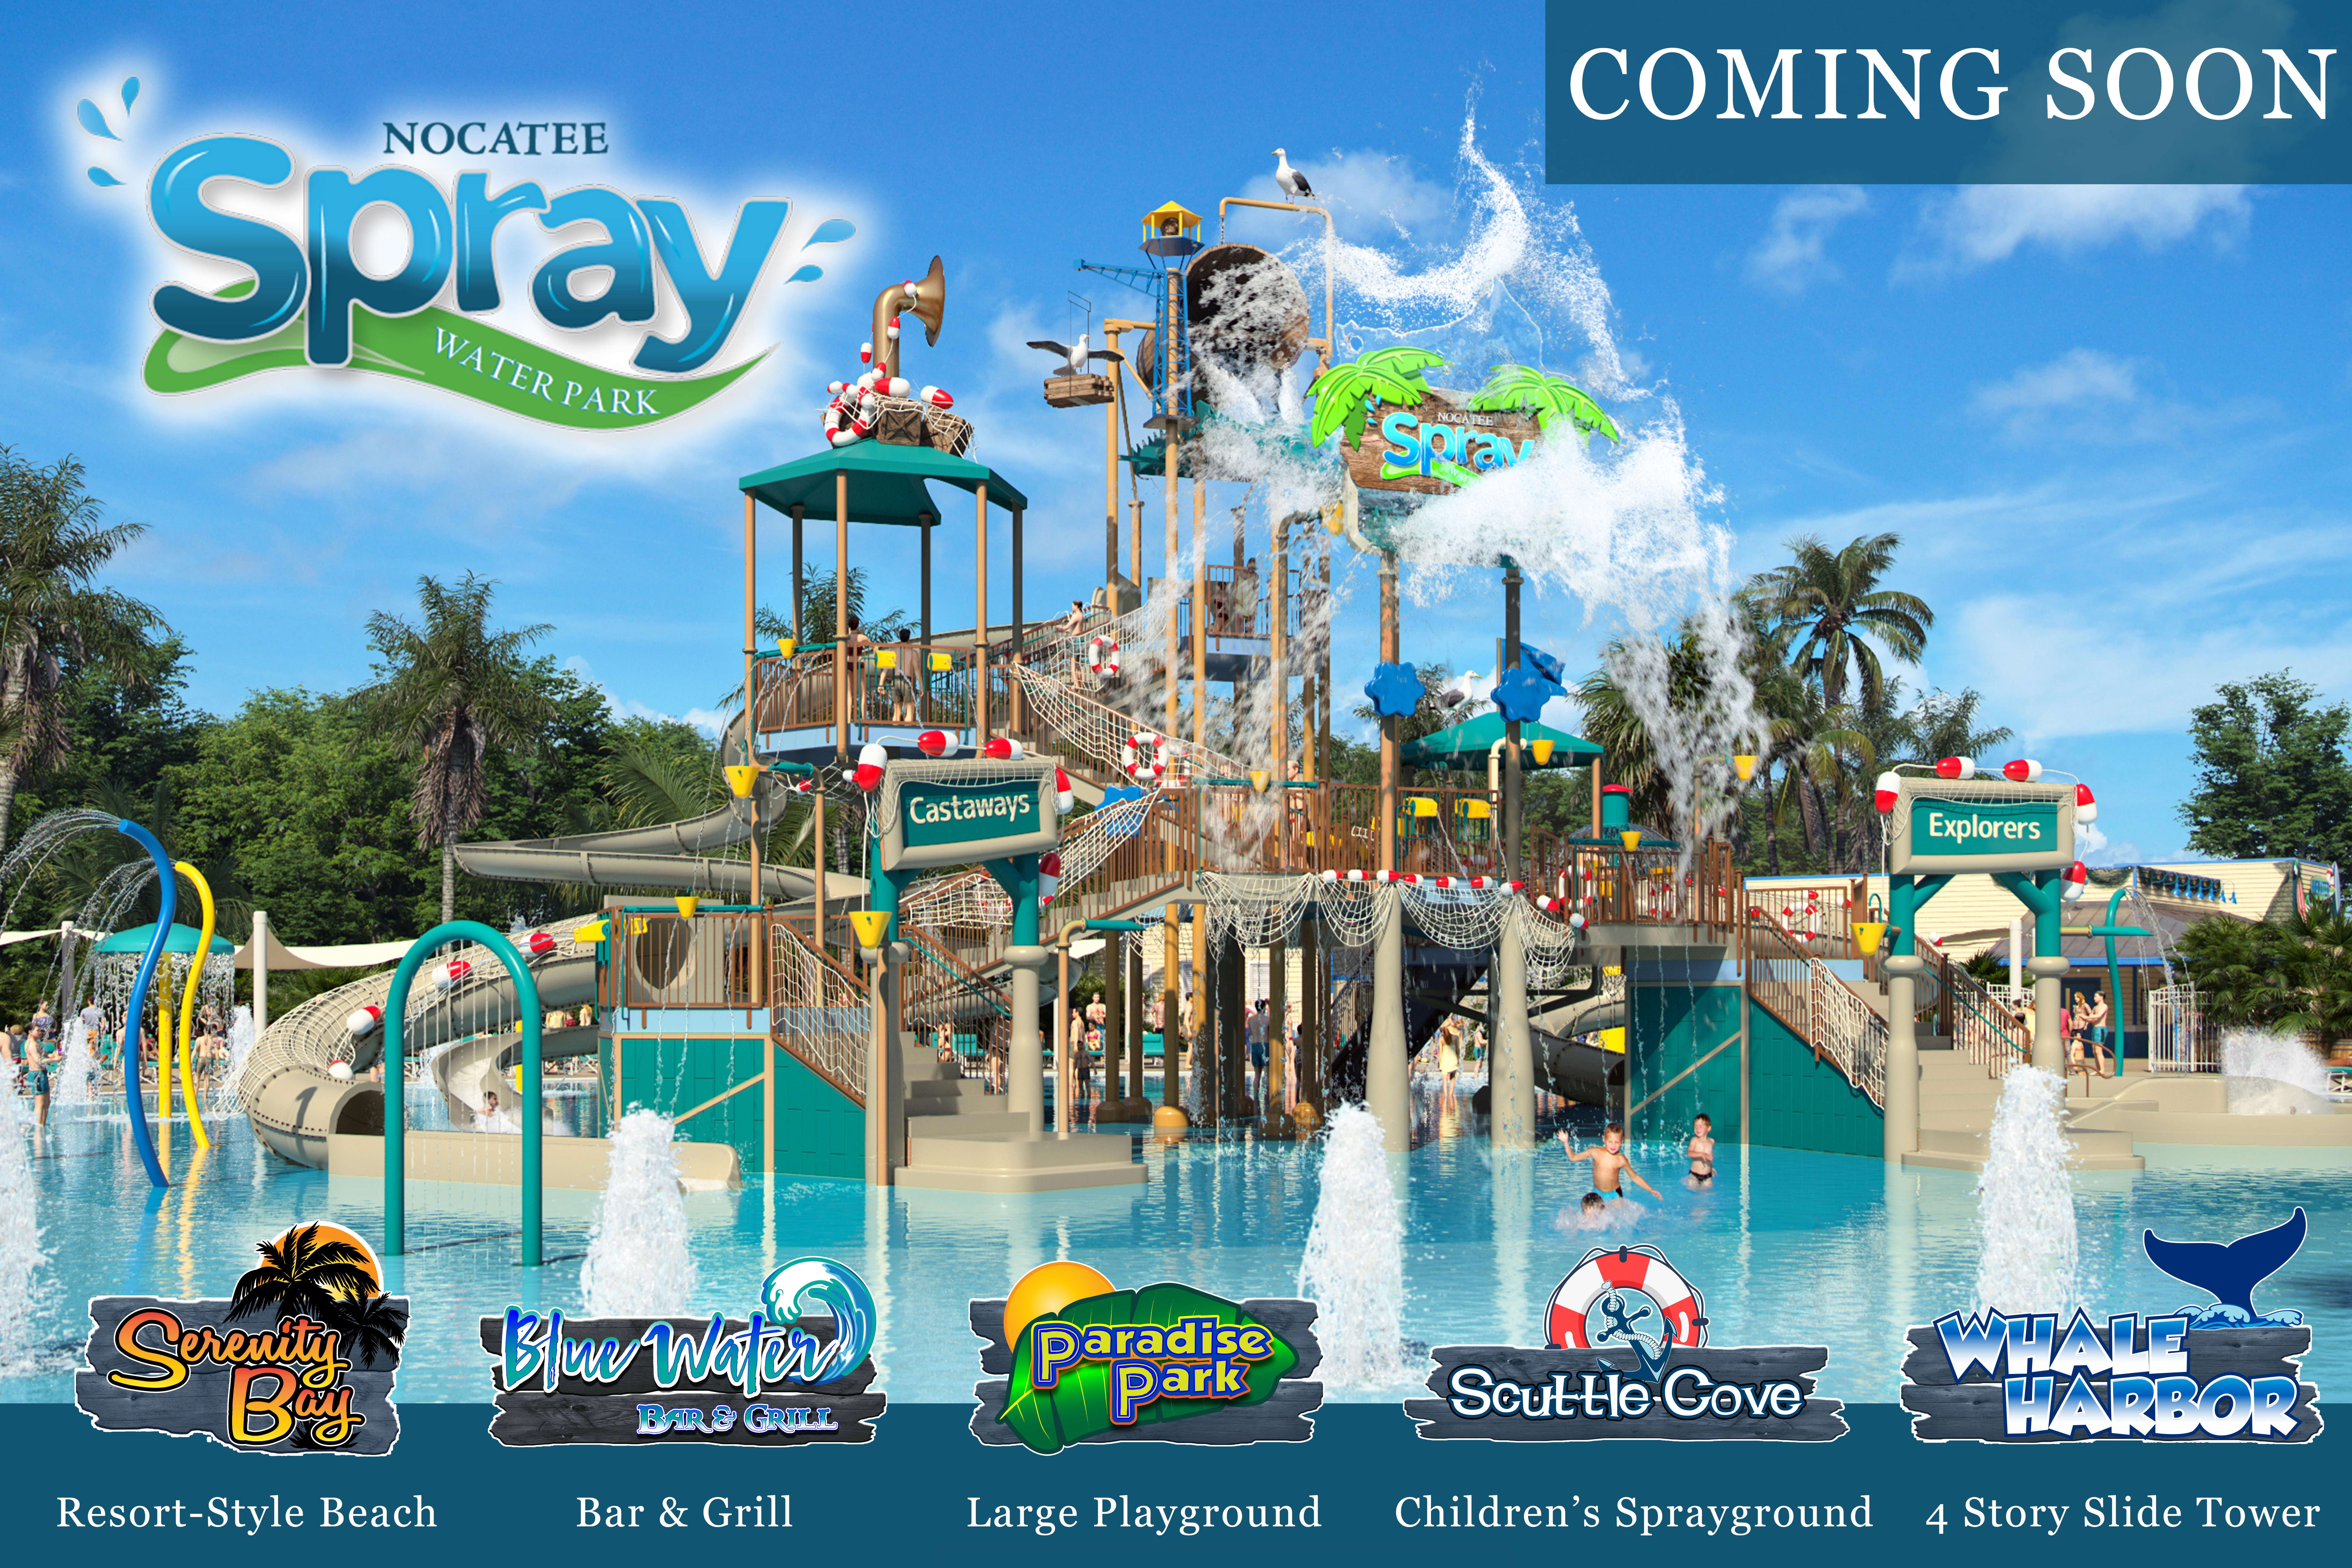 Nocatee Spray Park Coming Soon